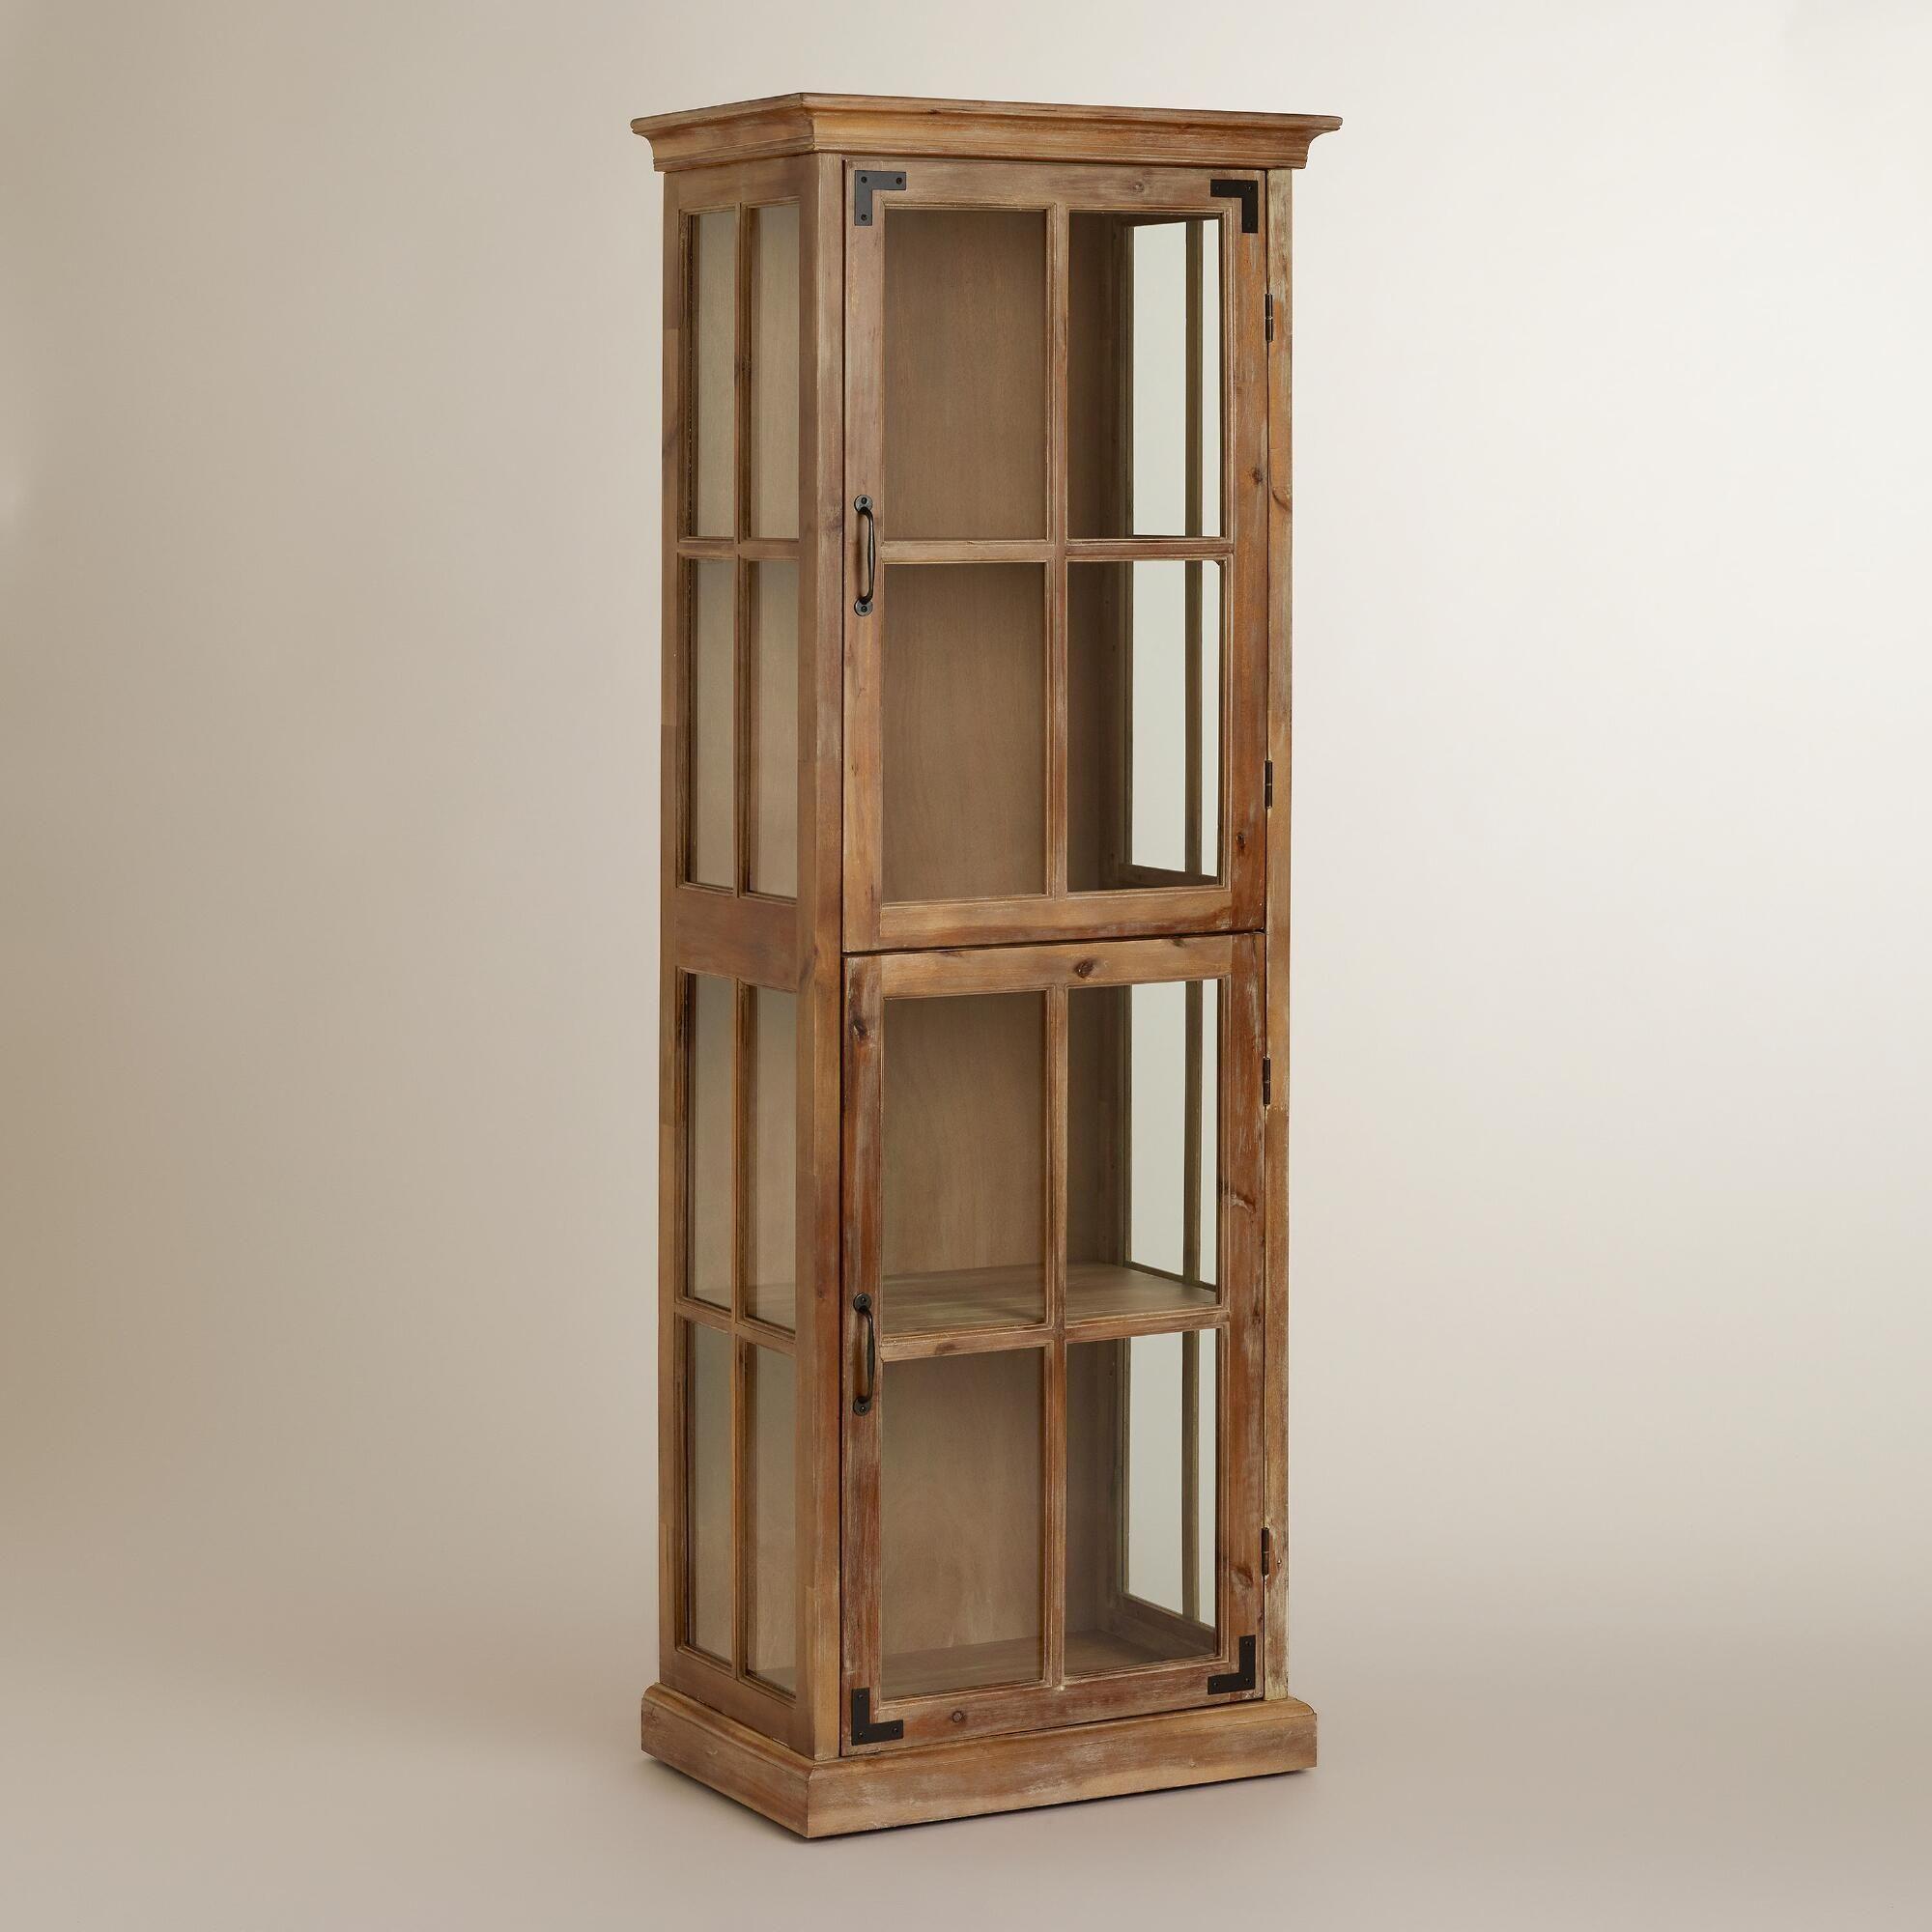 Vaisselier Etroit: Small Narrow Curio Cabinet